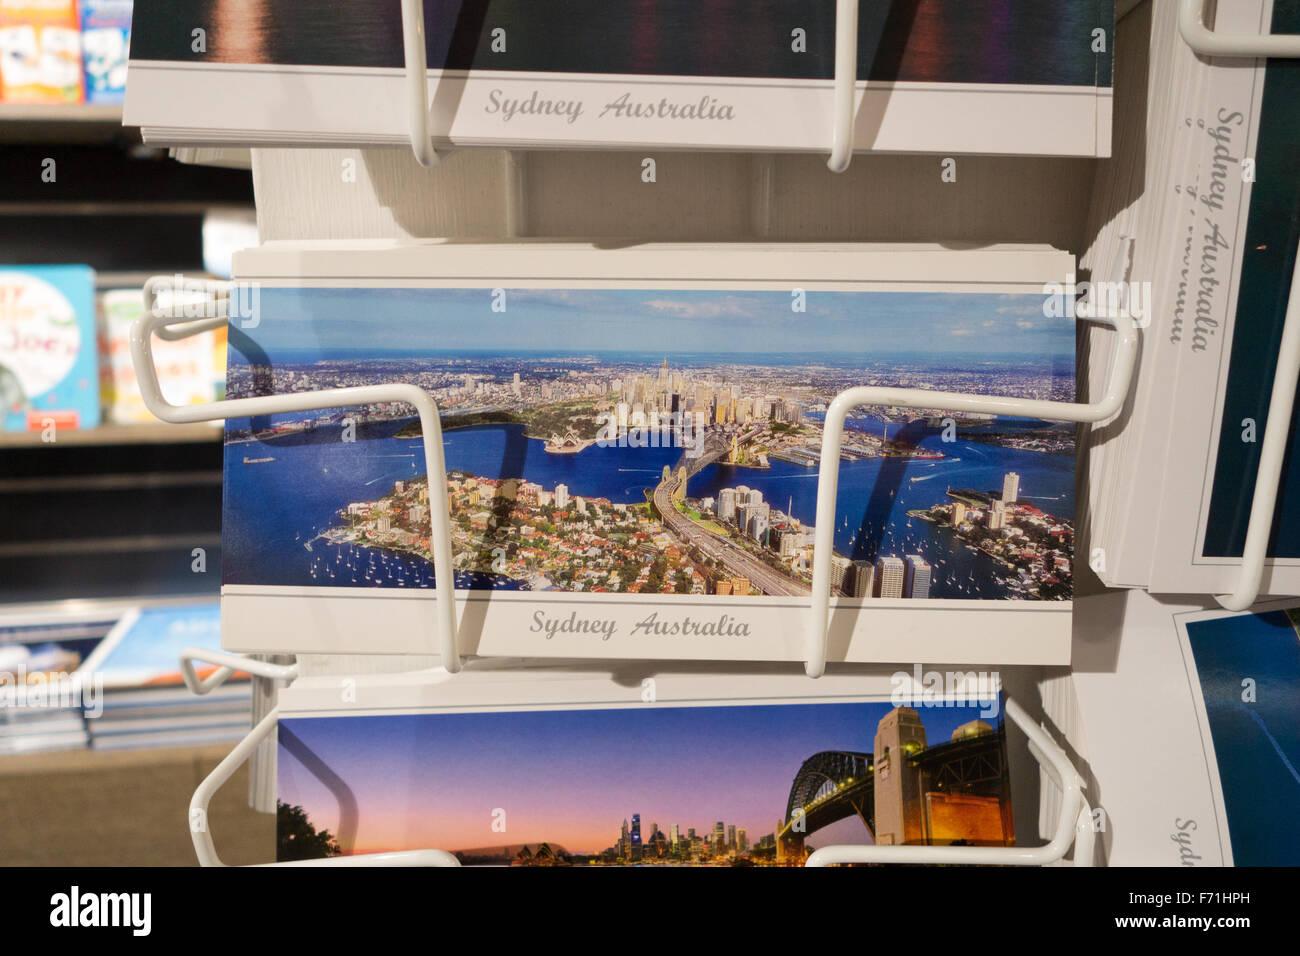 Australia postcards - Stock Image